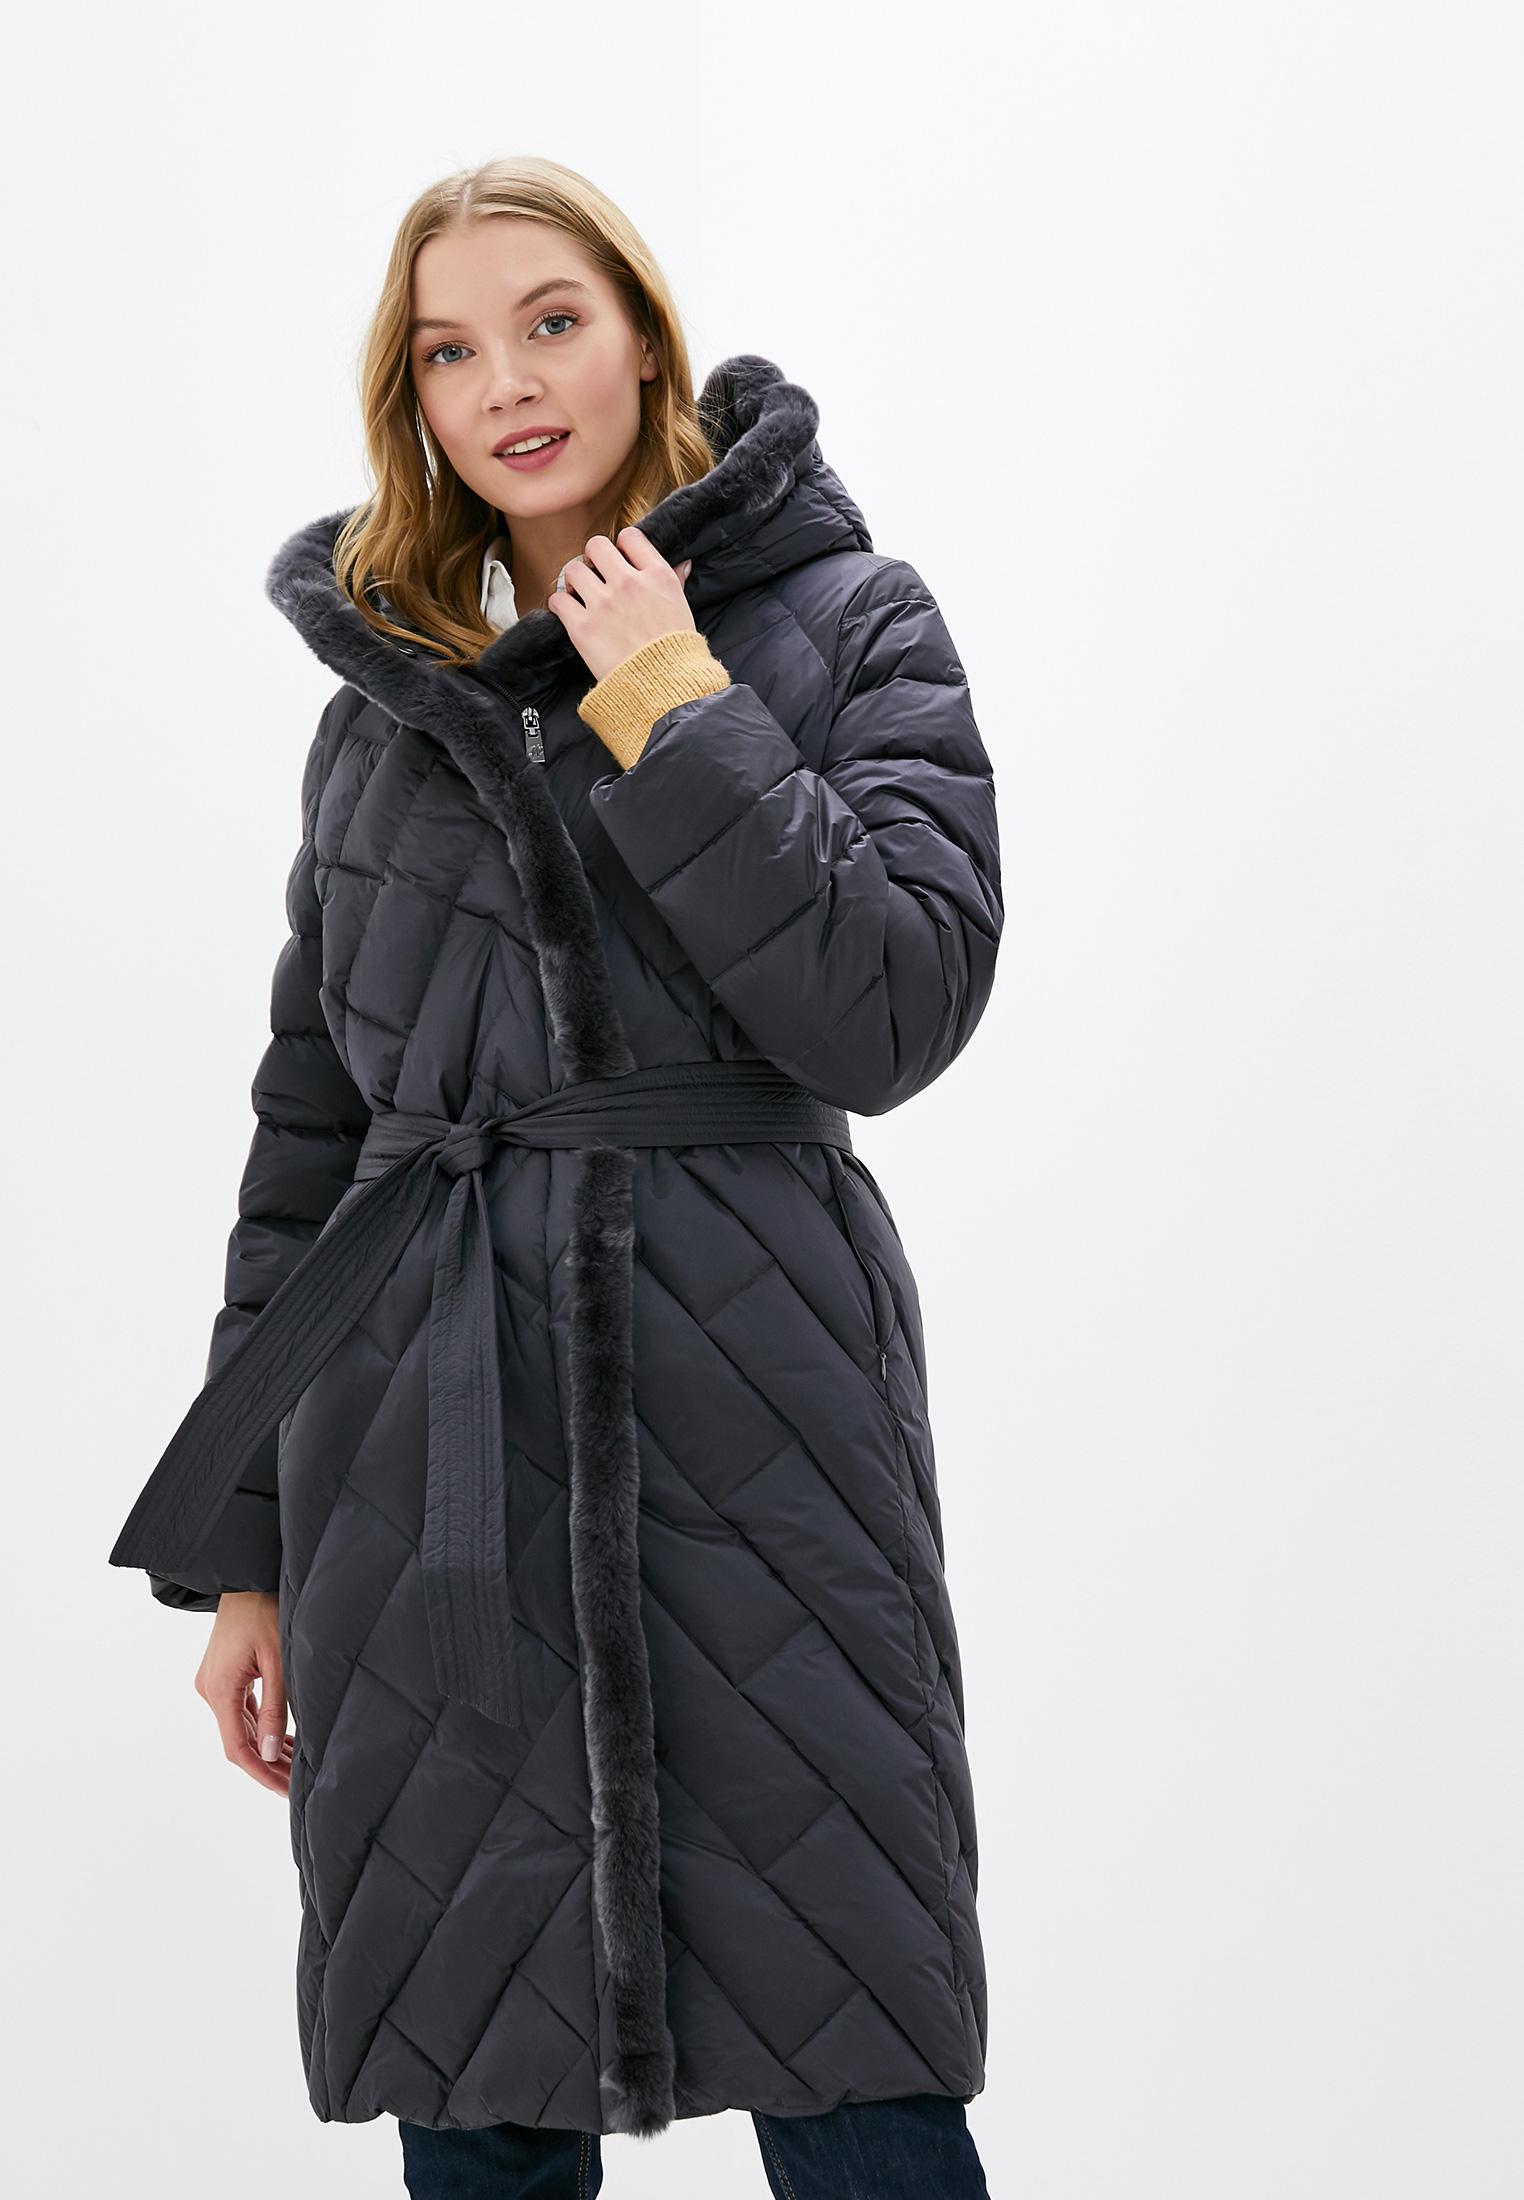 Утепленная куртка Odri Mio Пальто ODRI Mio